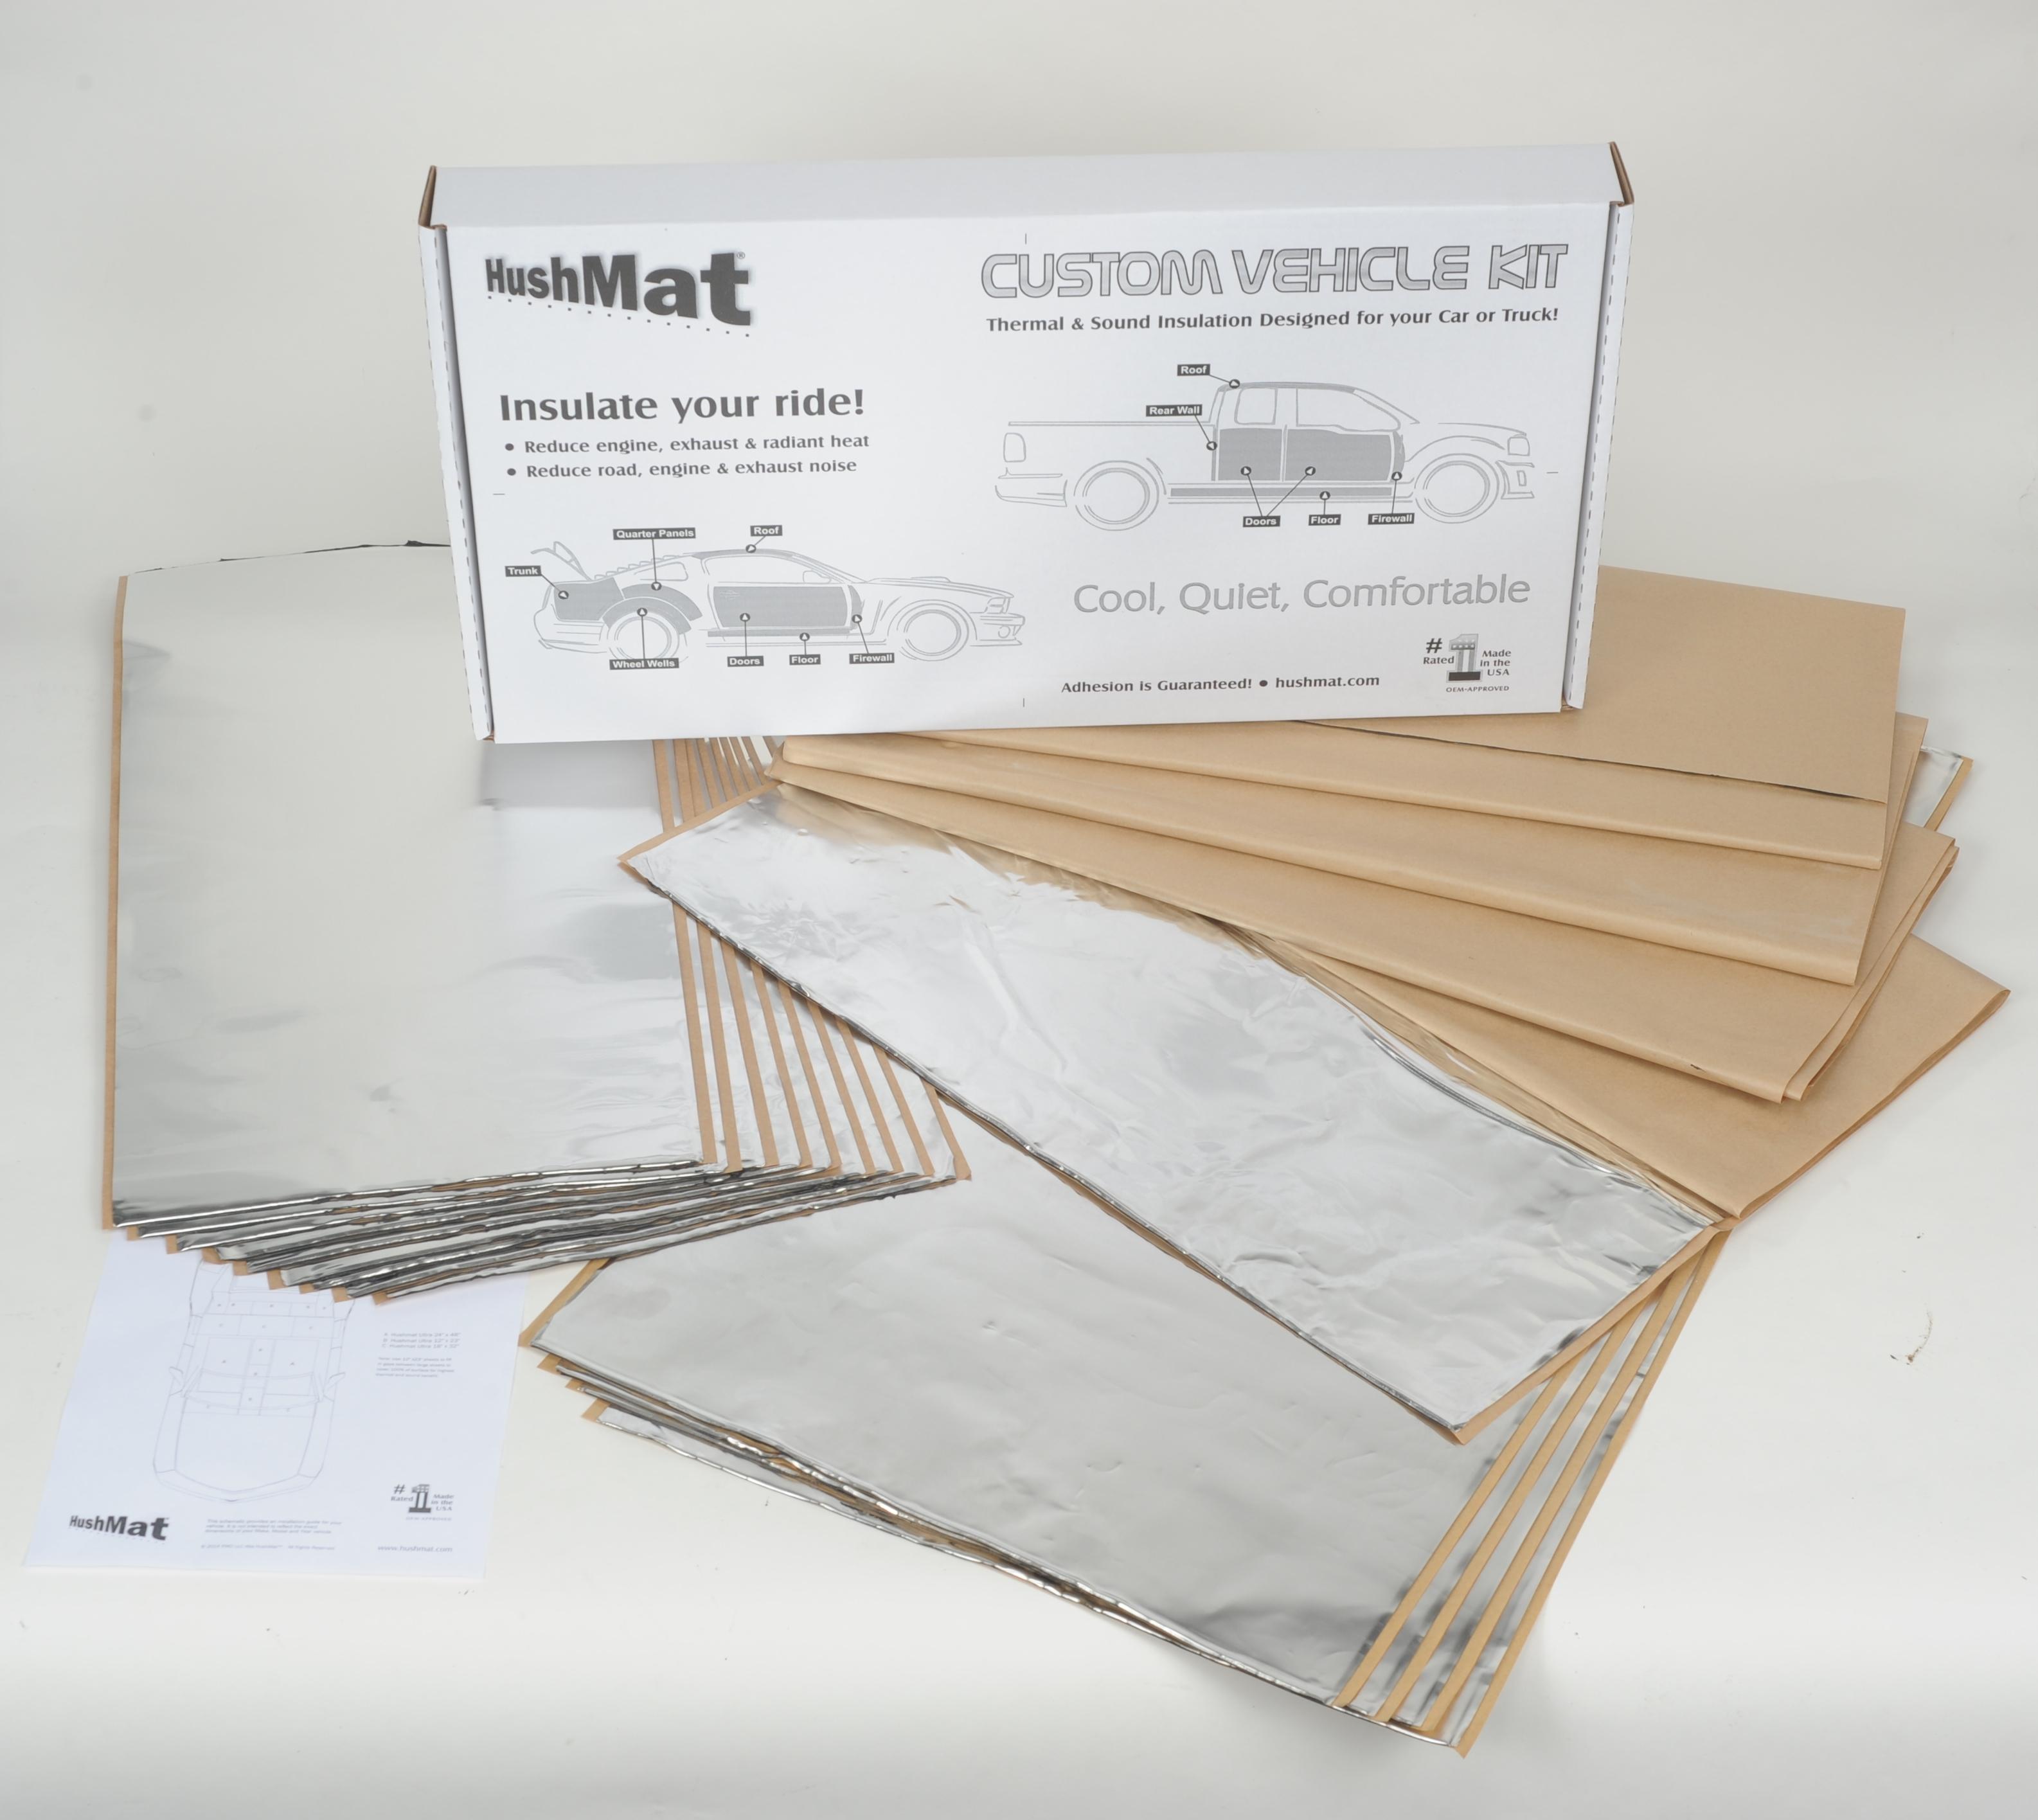 Hushmat 58015 Complete Vehicle Custom Insulation Kit